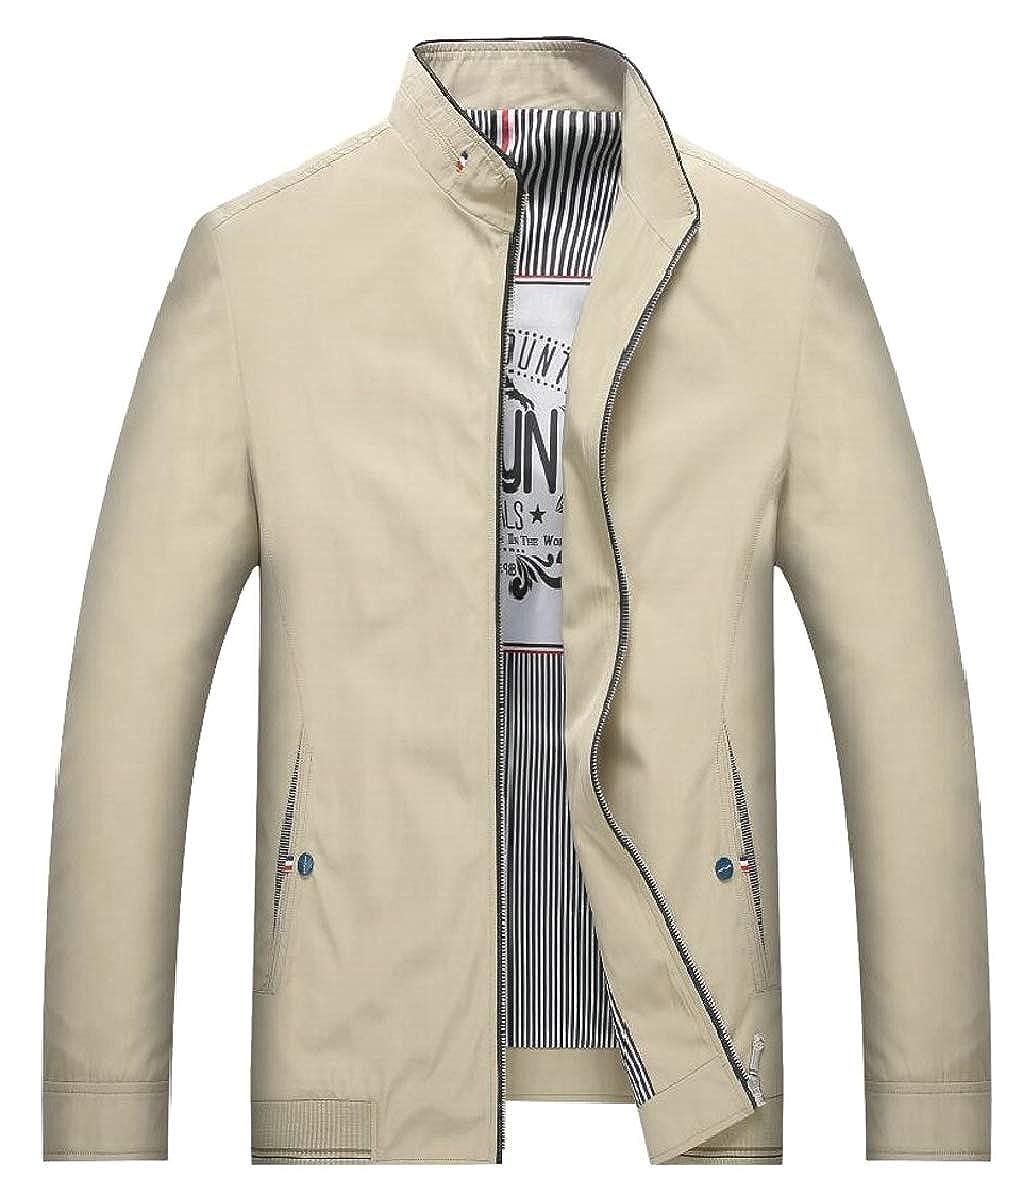 93dcb88ae Khaki LEISHOP Men's Casual Stand Collar Coats Windbreaker ...